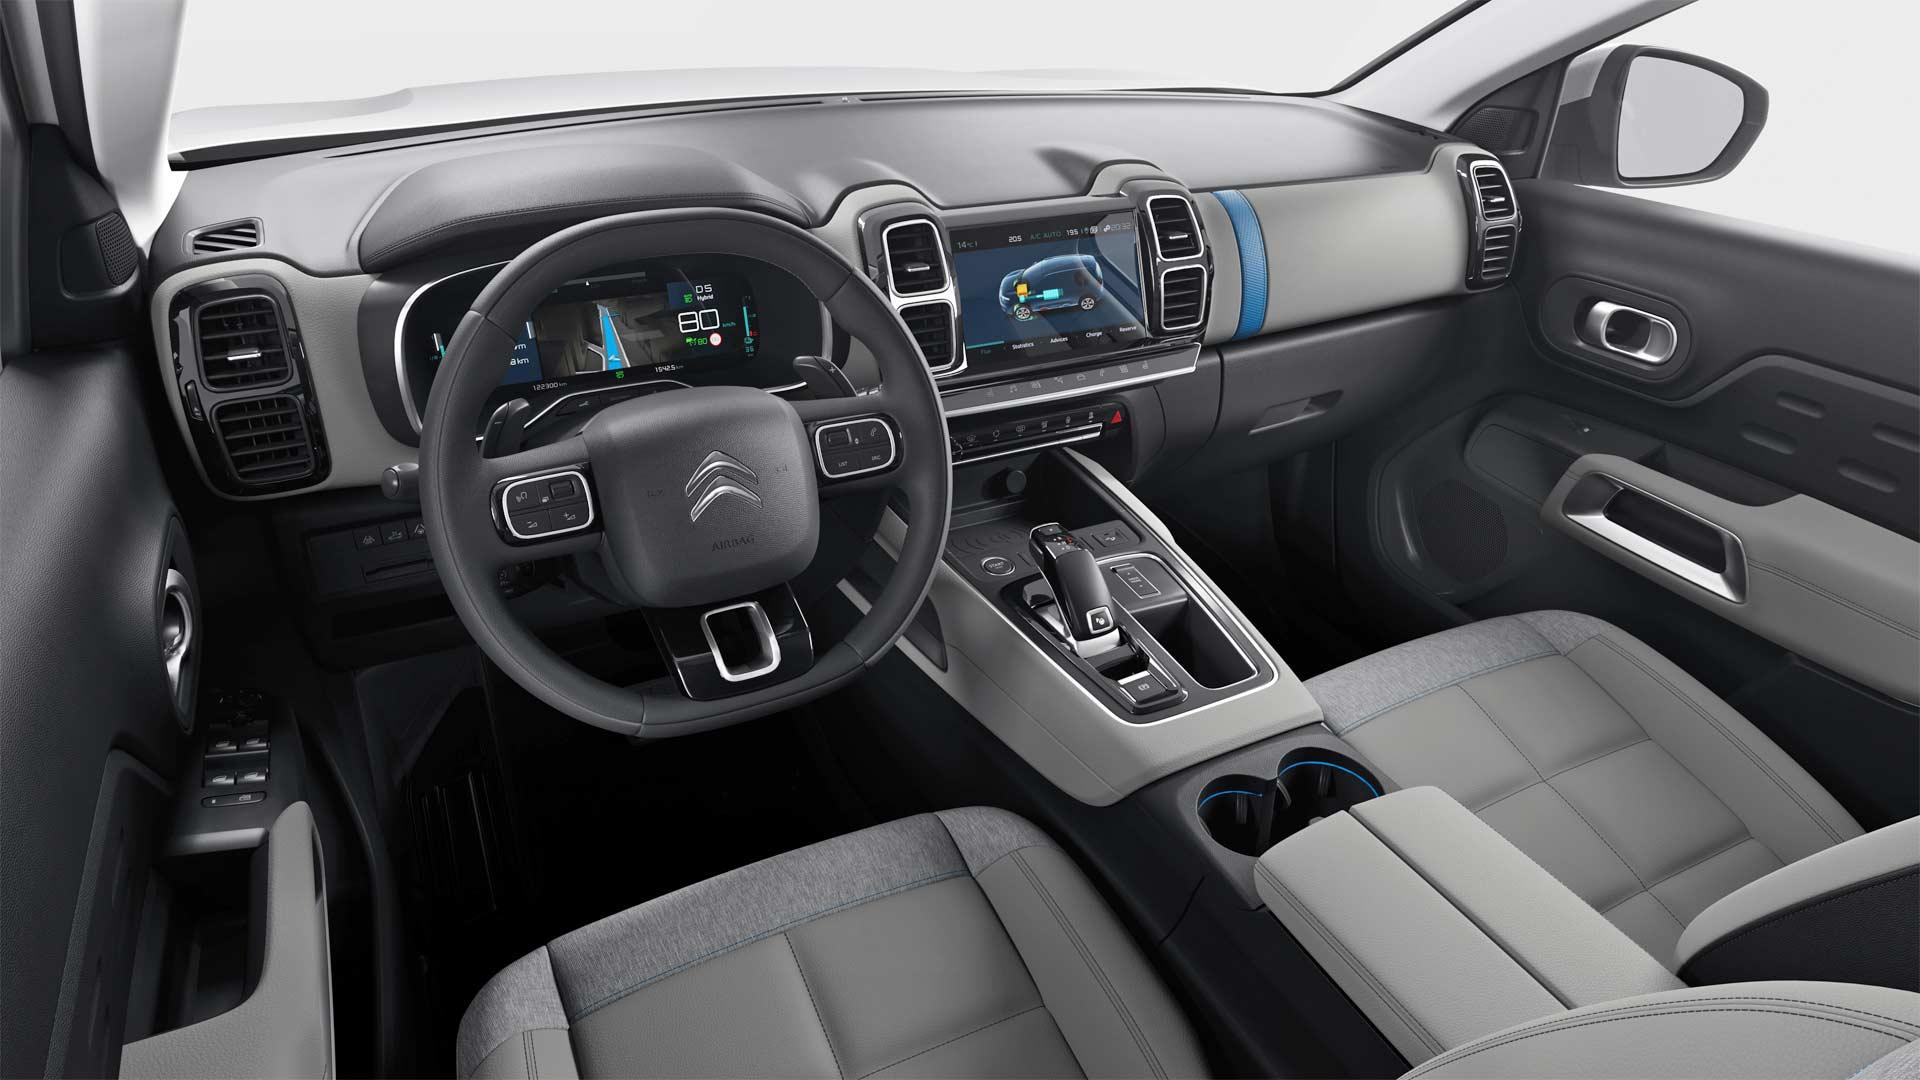 2019-Citroen-C5-Aircross-Plug-In-Hybrid-interior